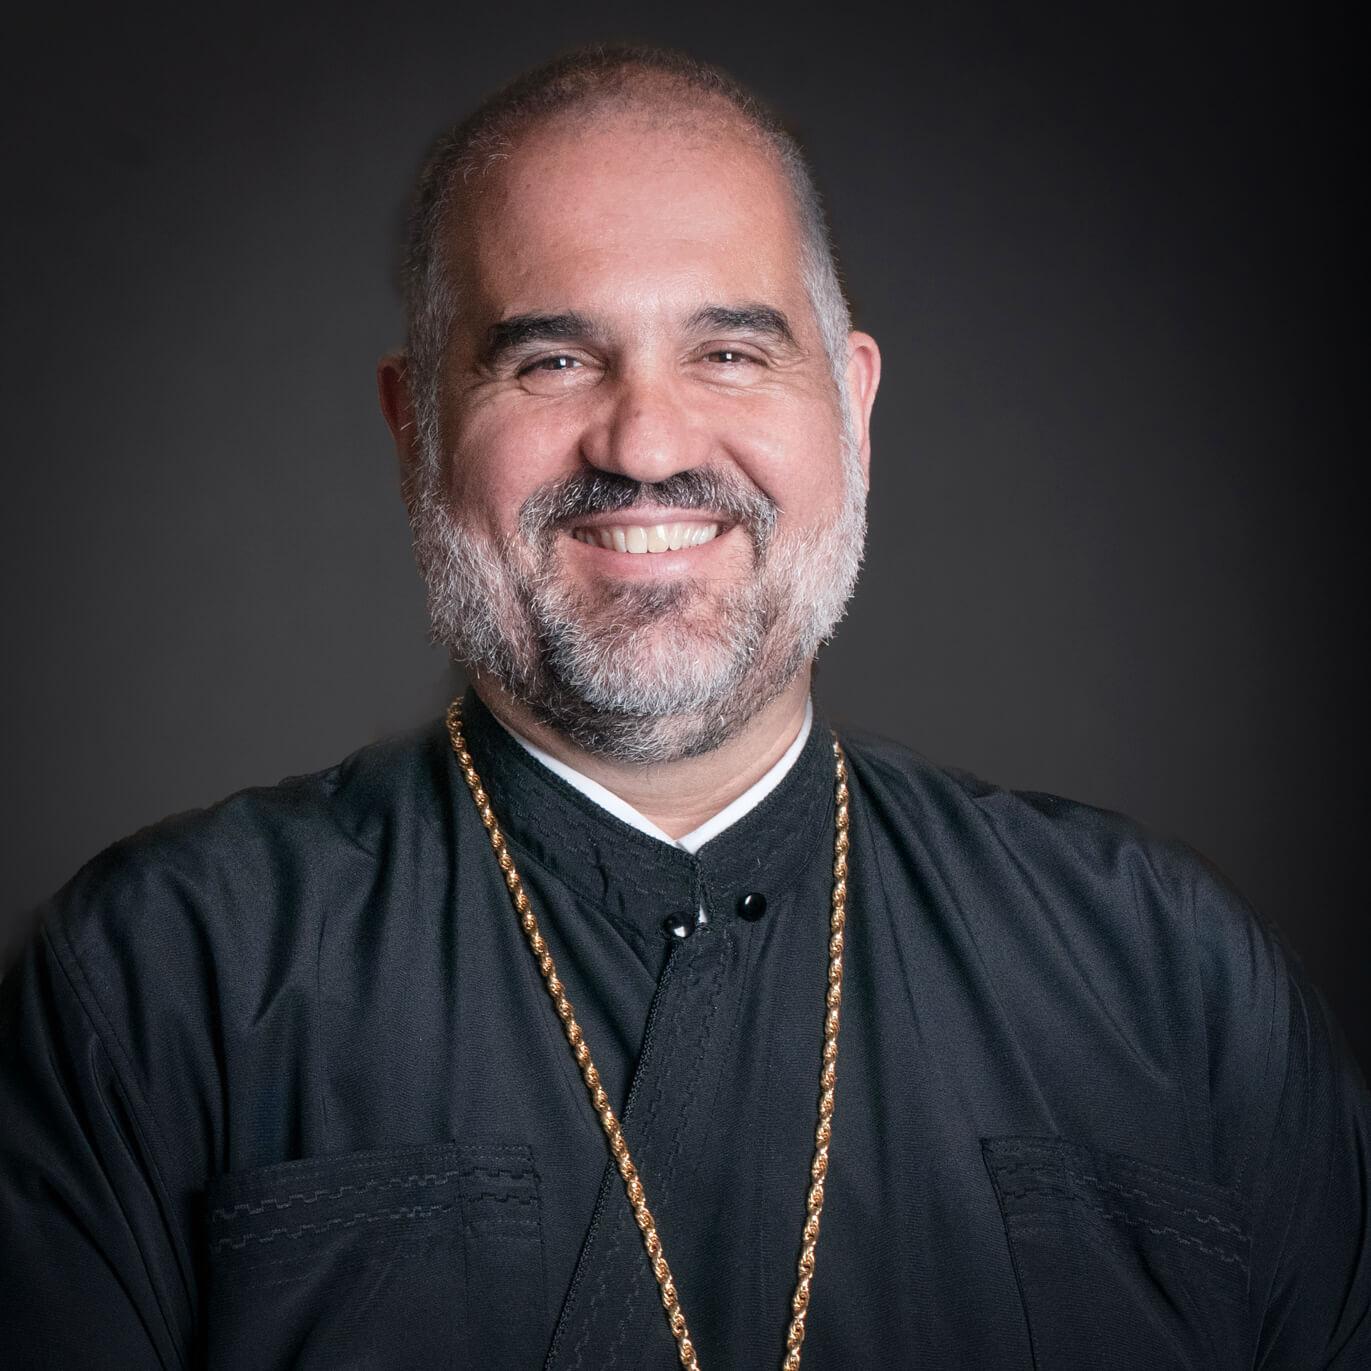 Reverend Athanasios C. Haros